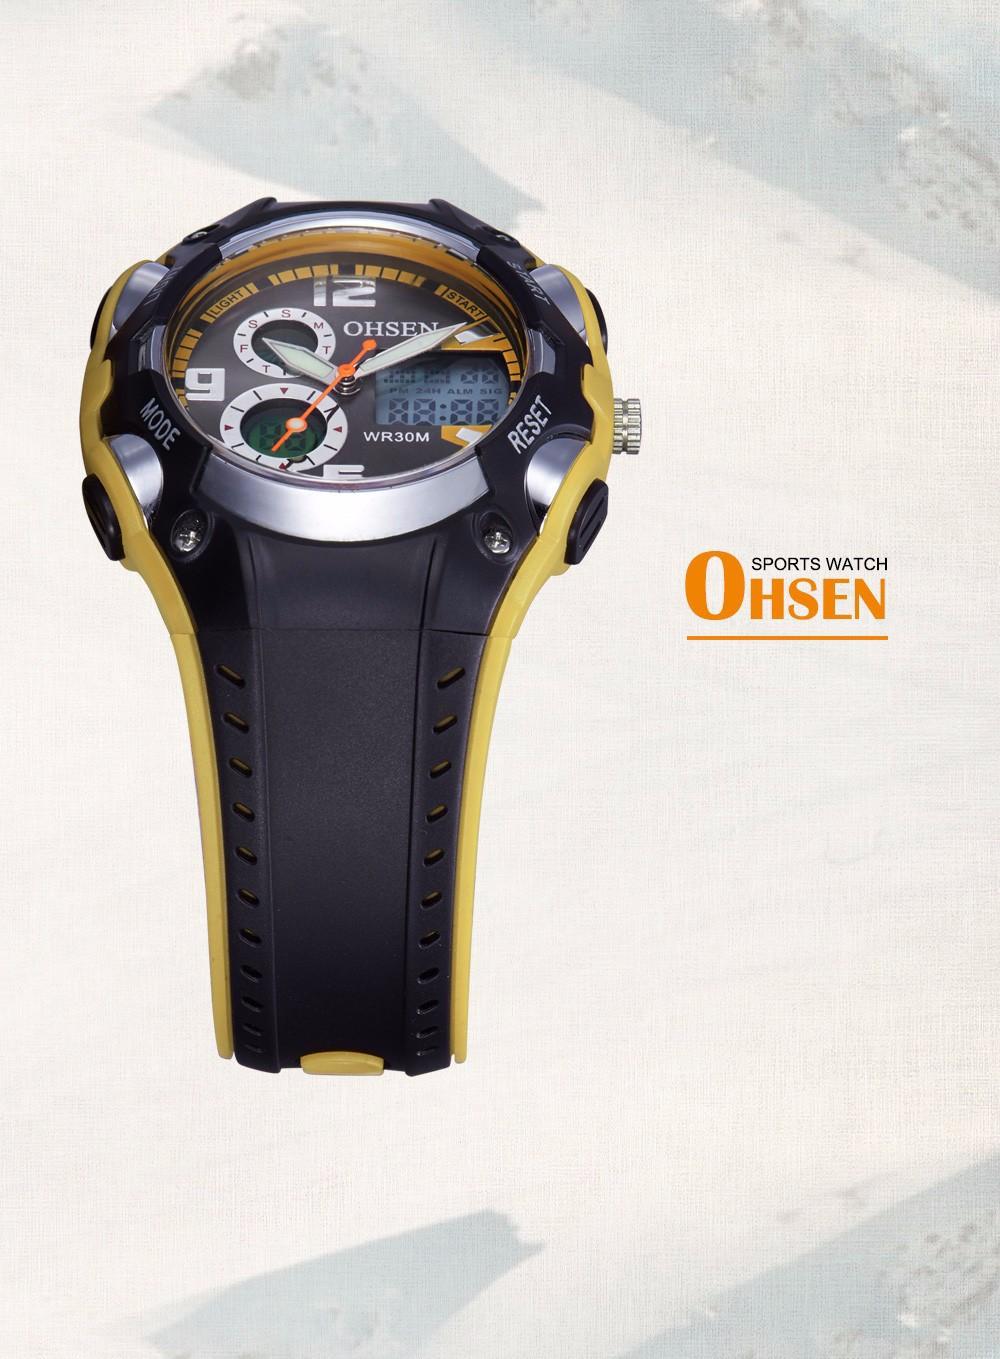 Original Ohsen Brand Fashion Sports Men's Watches 30M Waterproof Rubber Black Rubber Band Digital Sport Wristwatch for Men Gift (19)